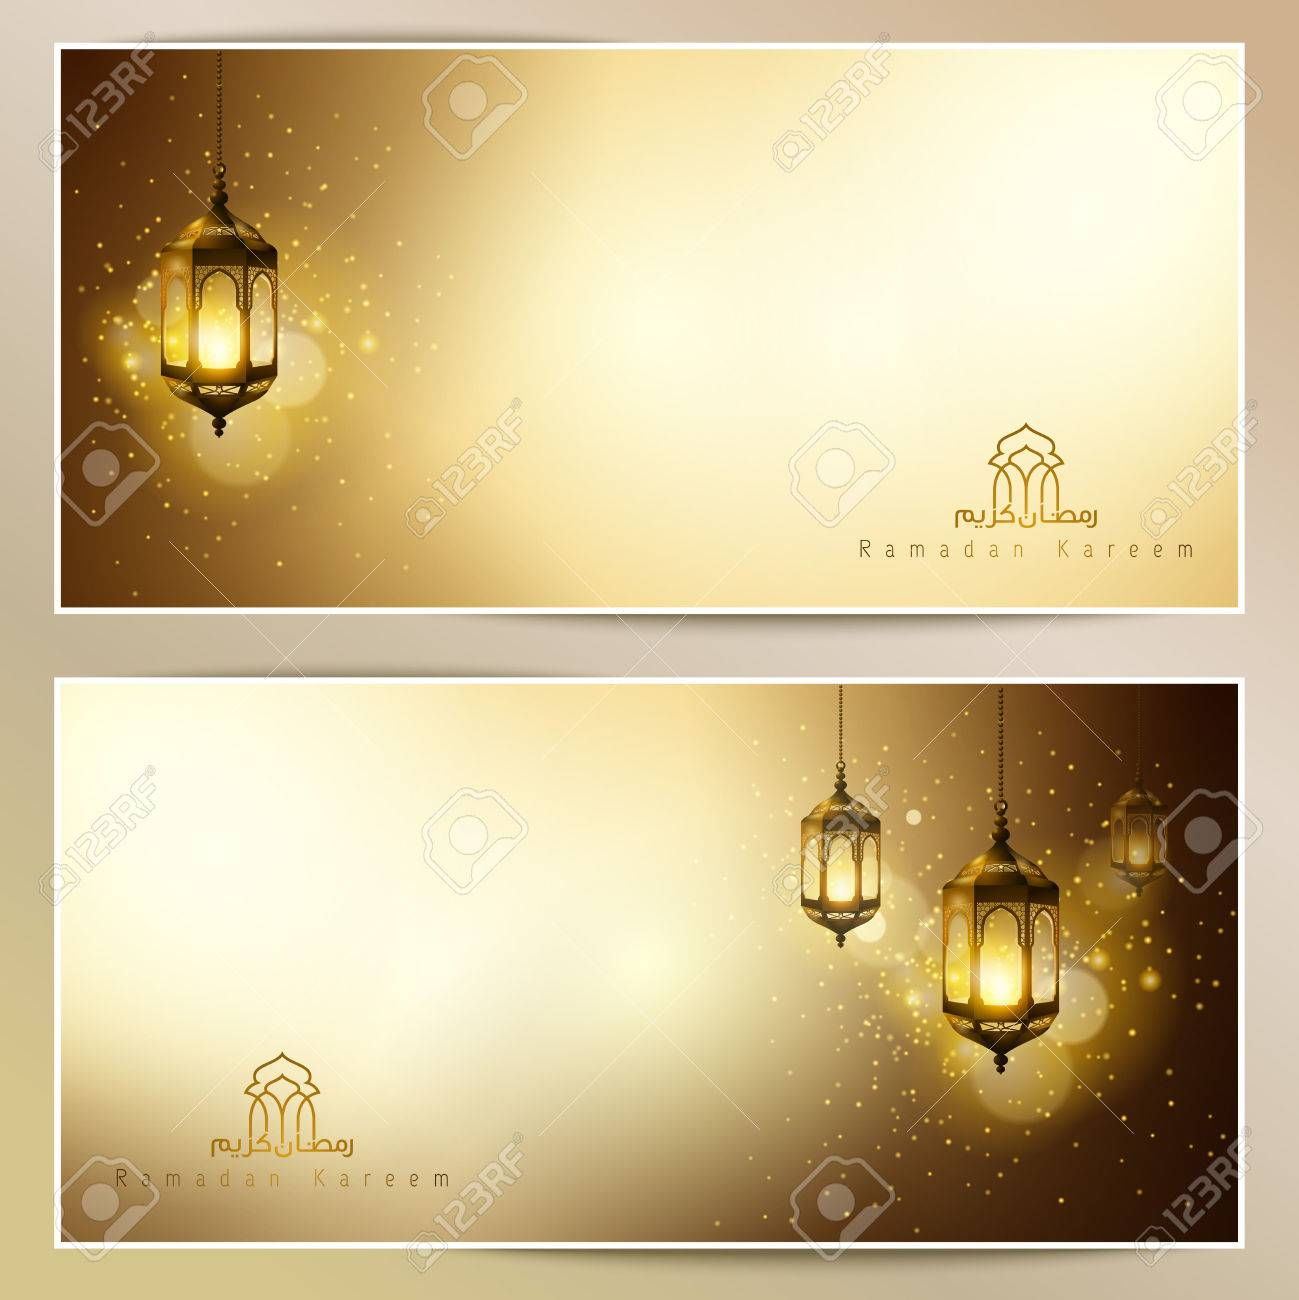 Ramadan Kareem greeting card glowing gold arabic lamp - 56667951